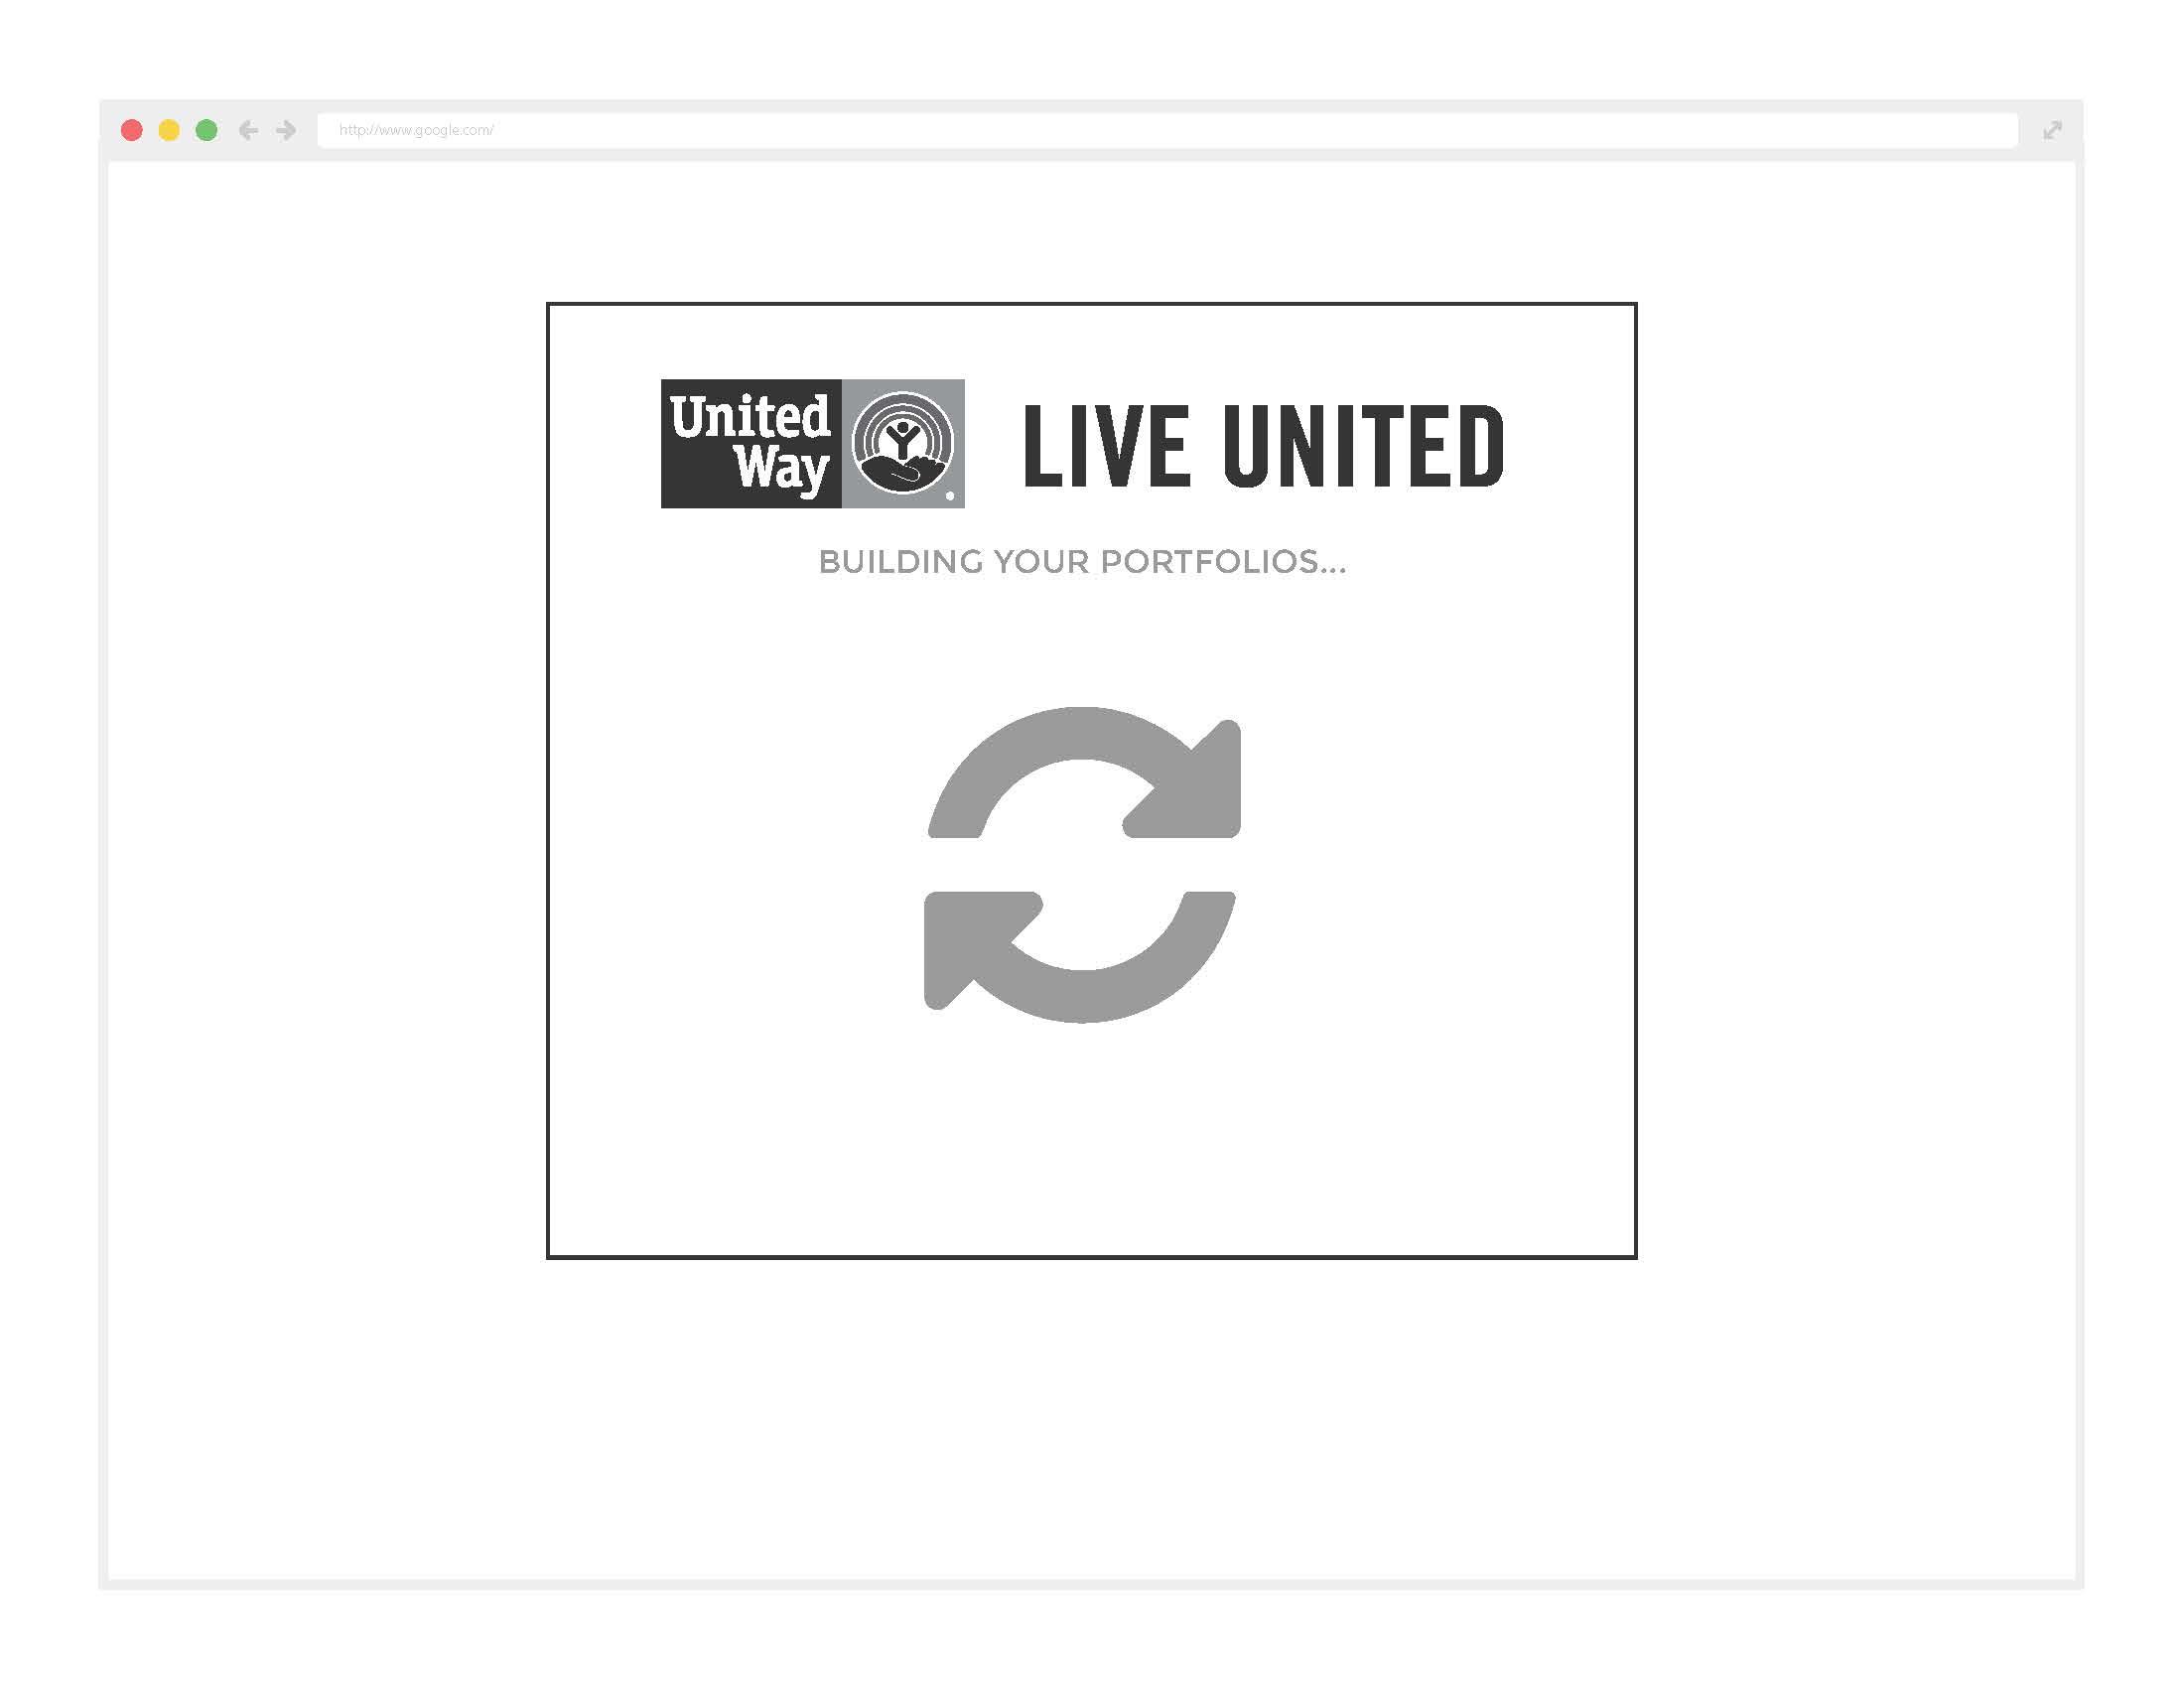 unitedway_Page_4.jpg